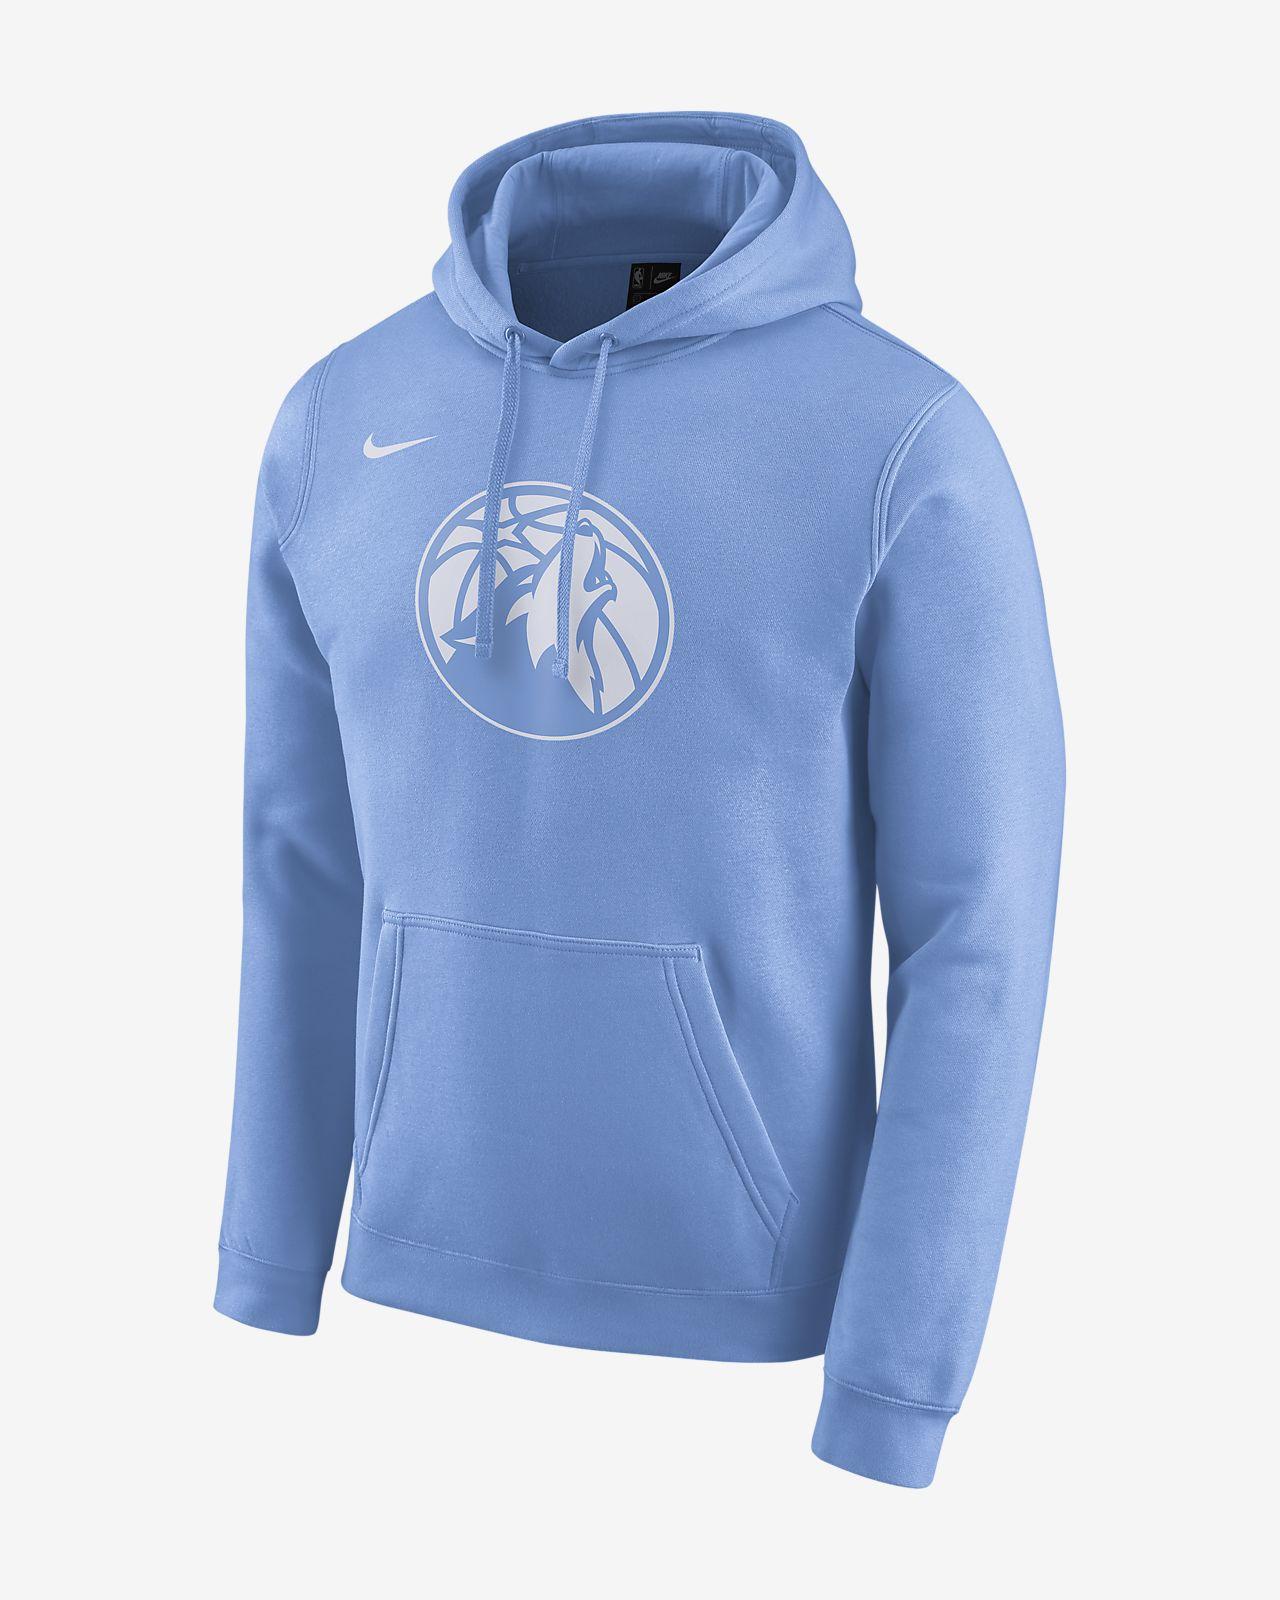 Timberwolves City Edition Logo Nike NBA s férfi kapucnis pulóver